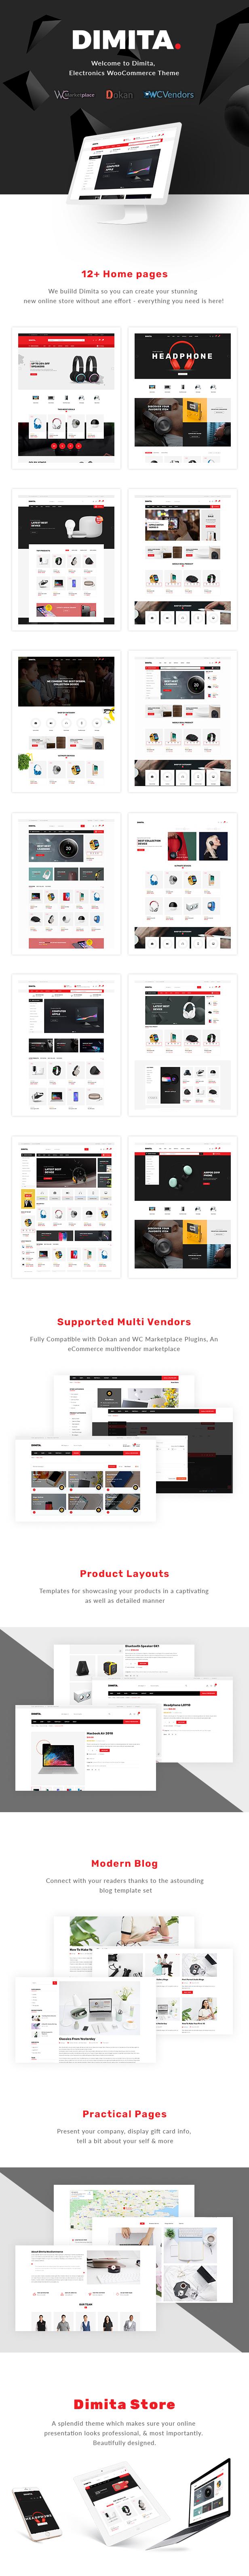 Dimita – Electronics WordPress Theme for WooCommerce - 1